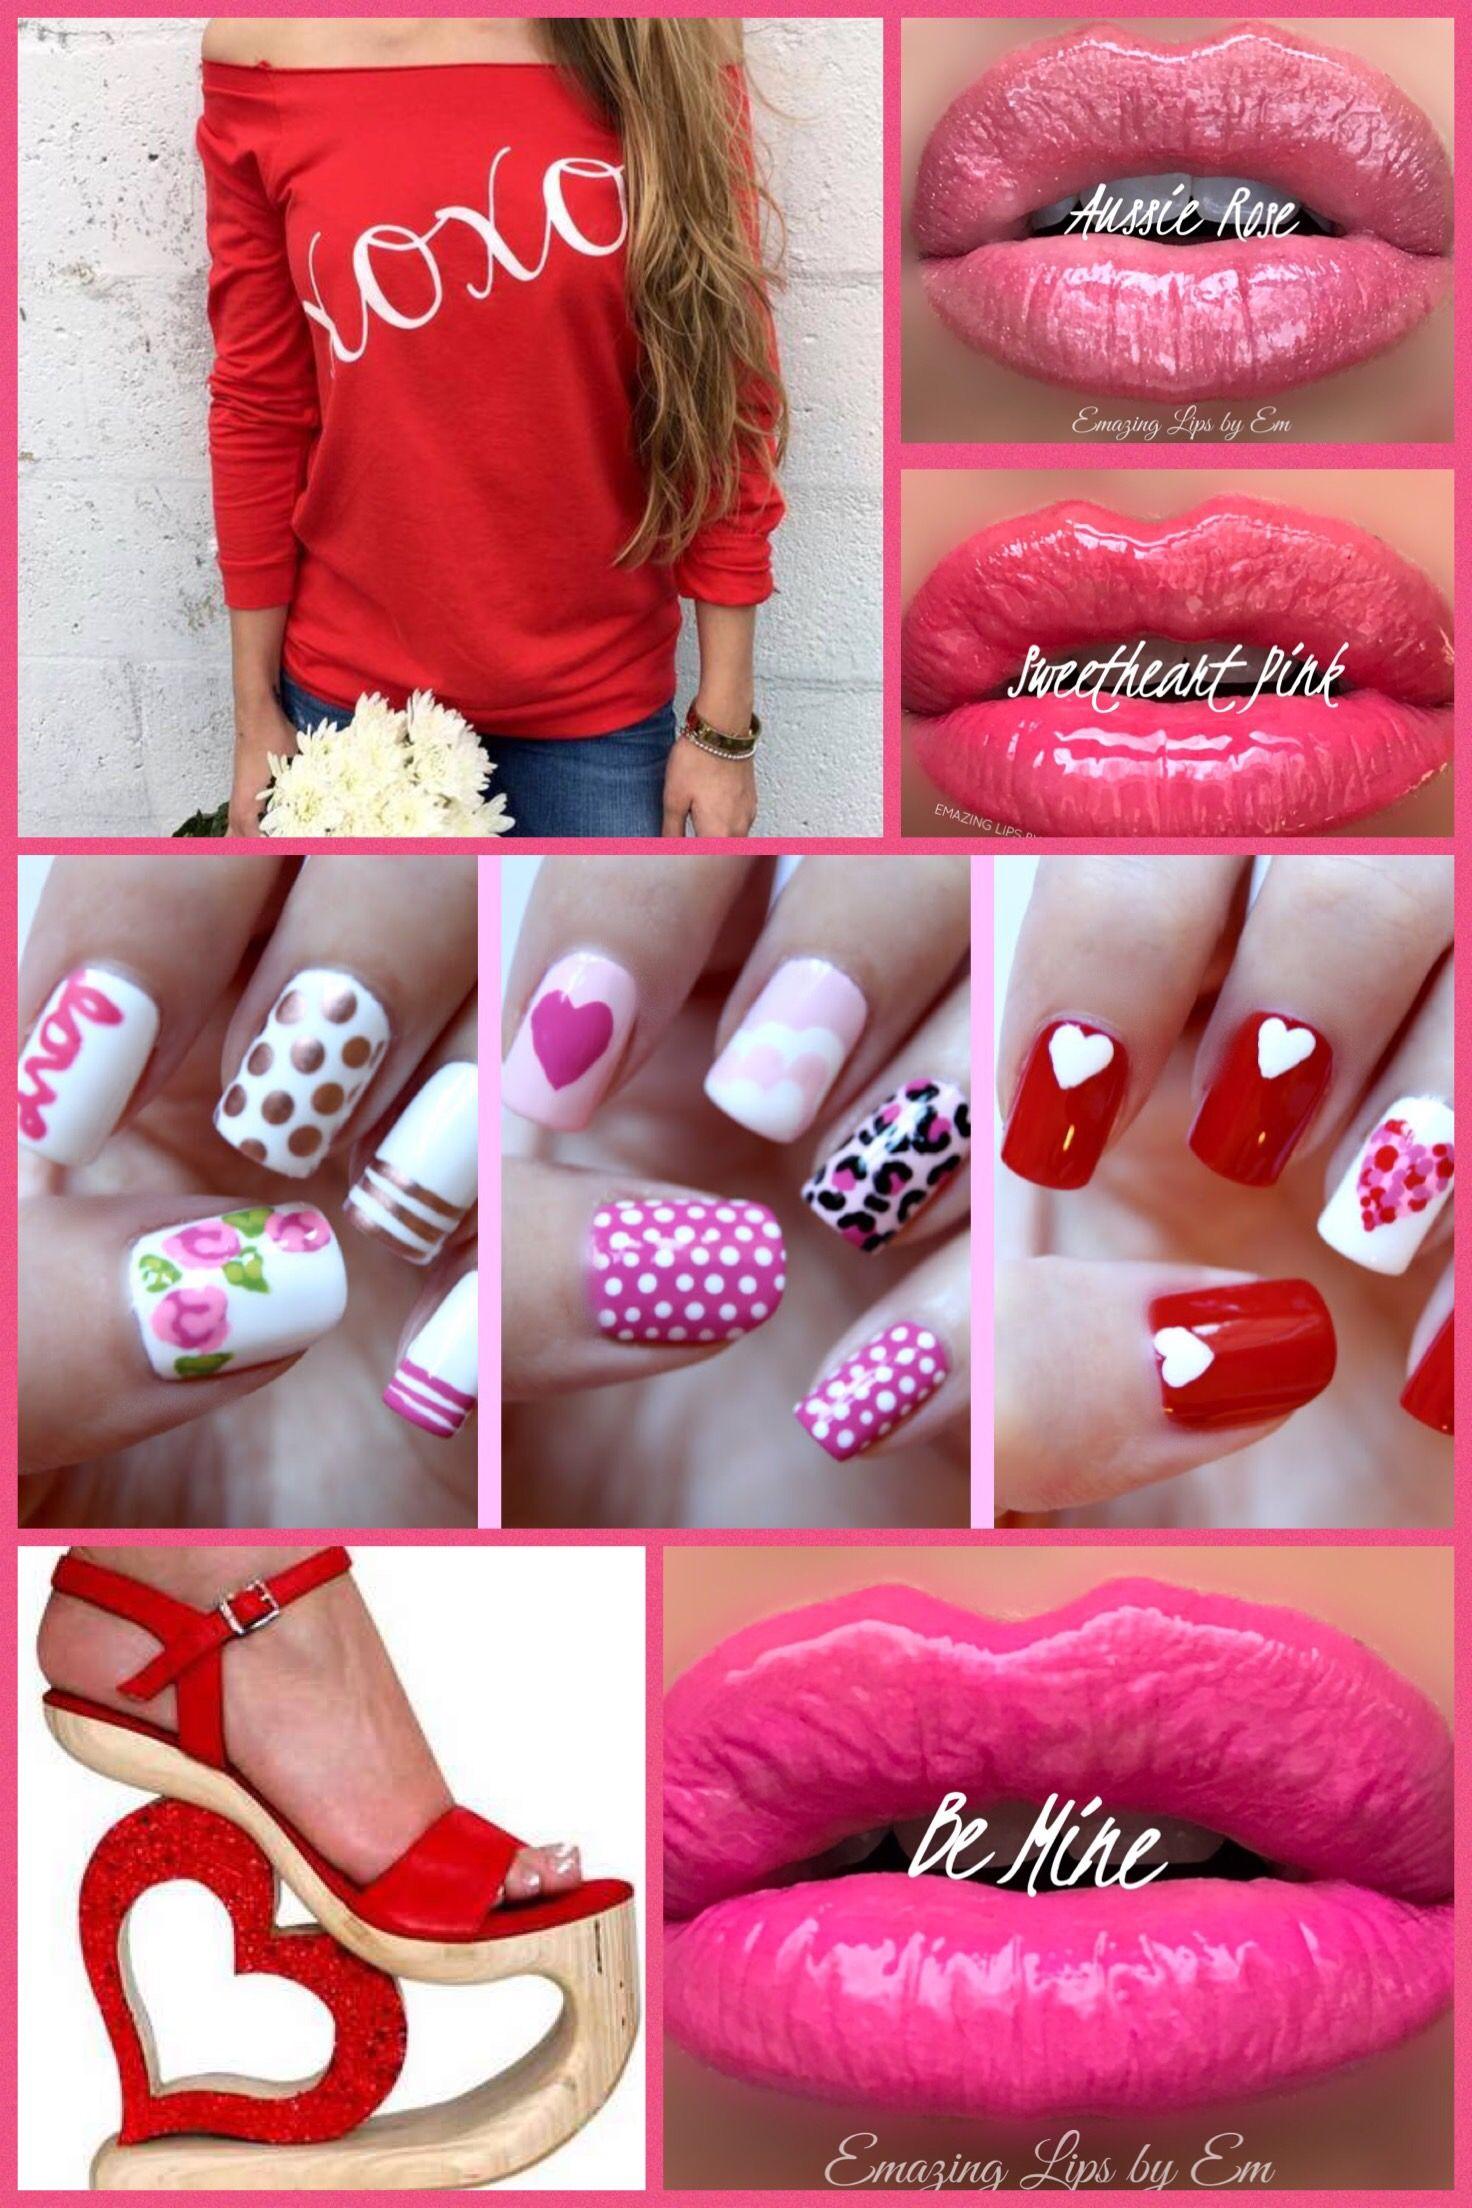 Valentine S Day Looks Graphic Outfit Fingernails Valentines Lipsense Makeup Ideas Xoxo Shirt Be Mine Lipsense S Lipsense Lipsense Pinks Lipsense Aussie Rose